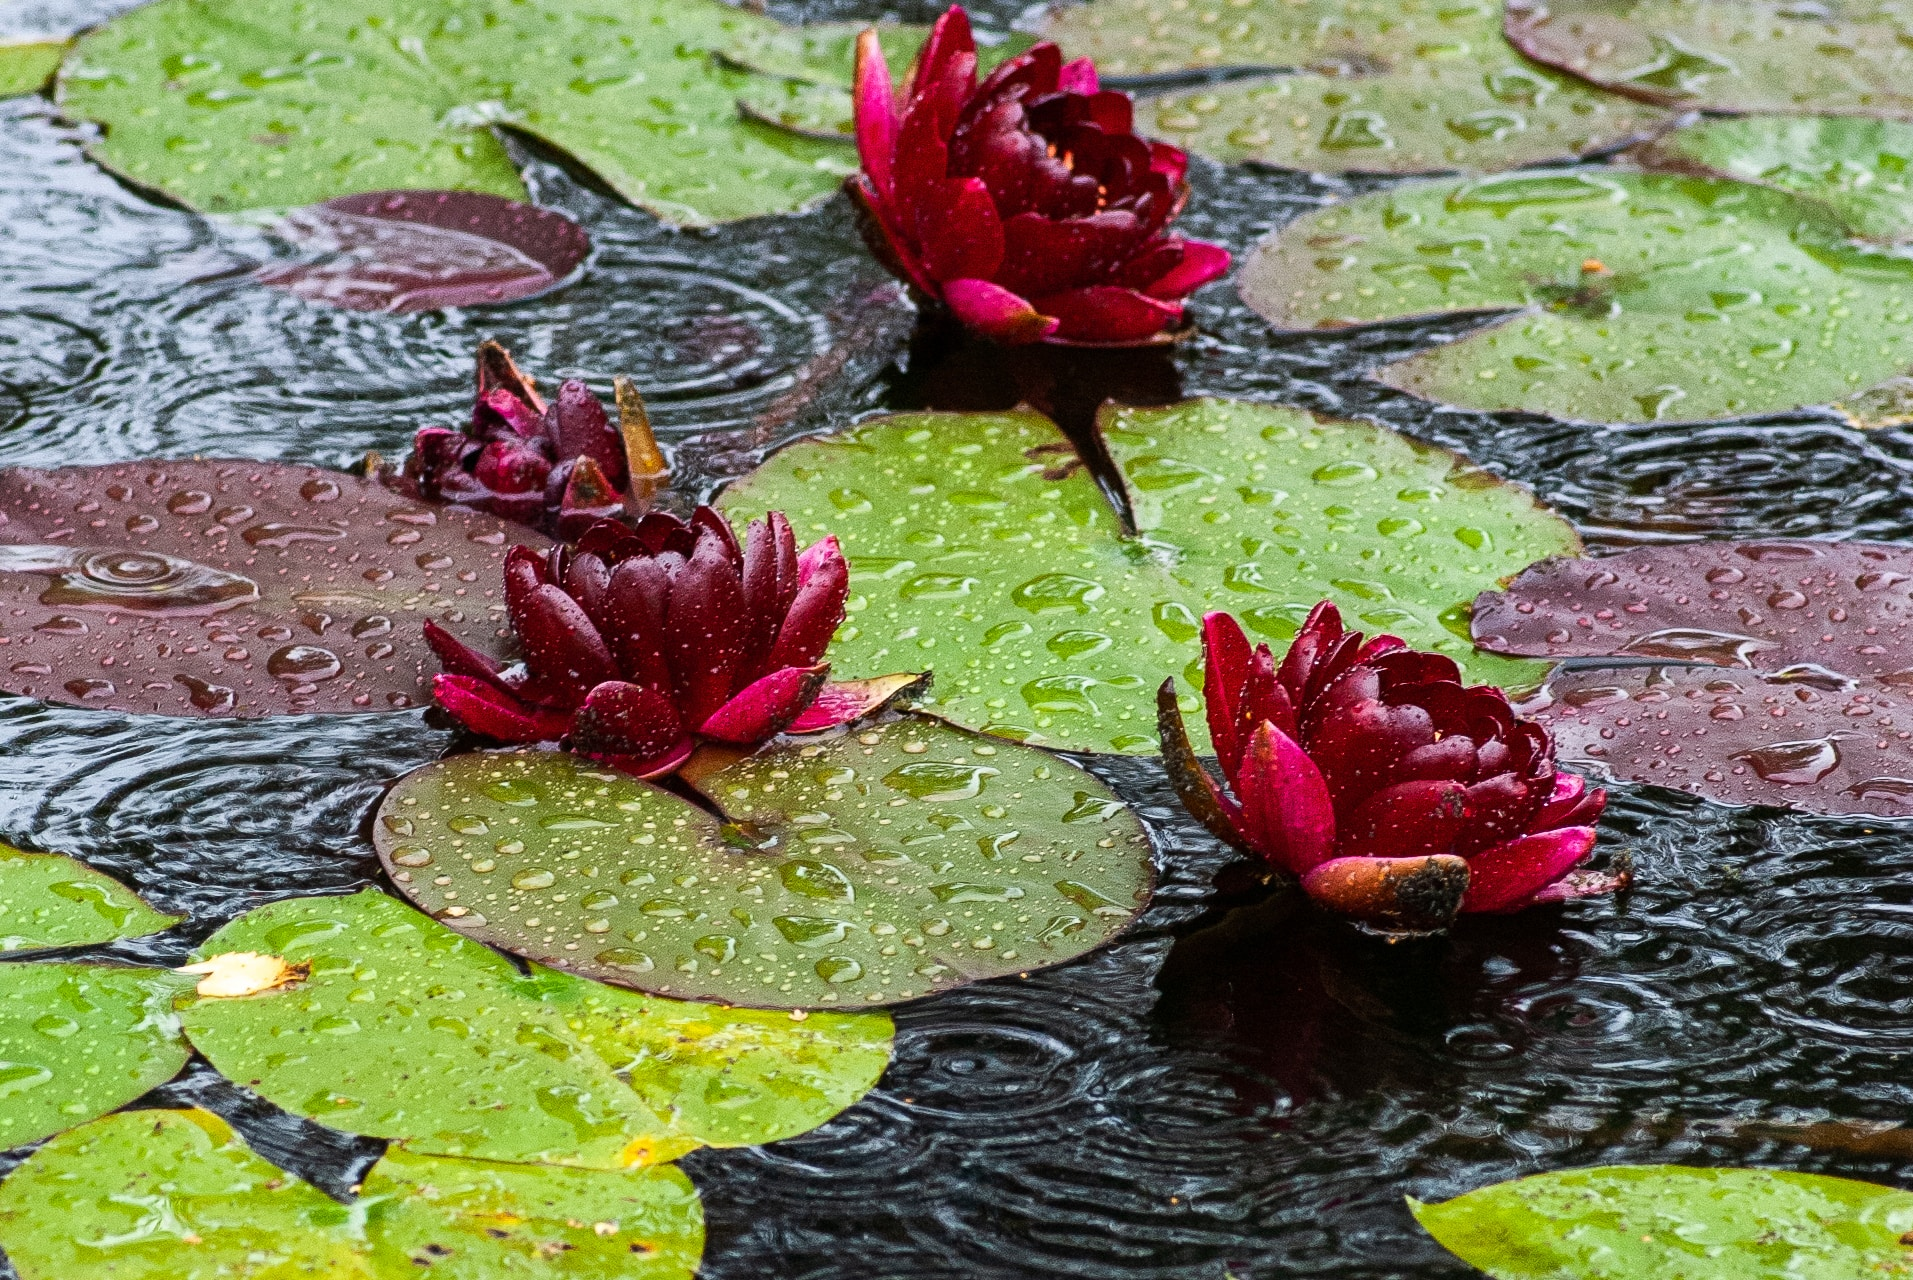 three purple flowers on body of water during rain